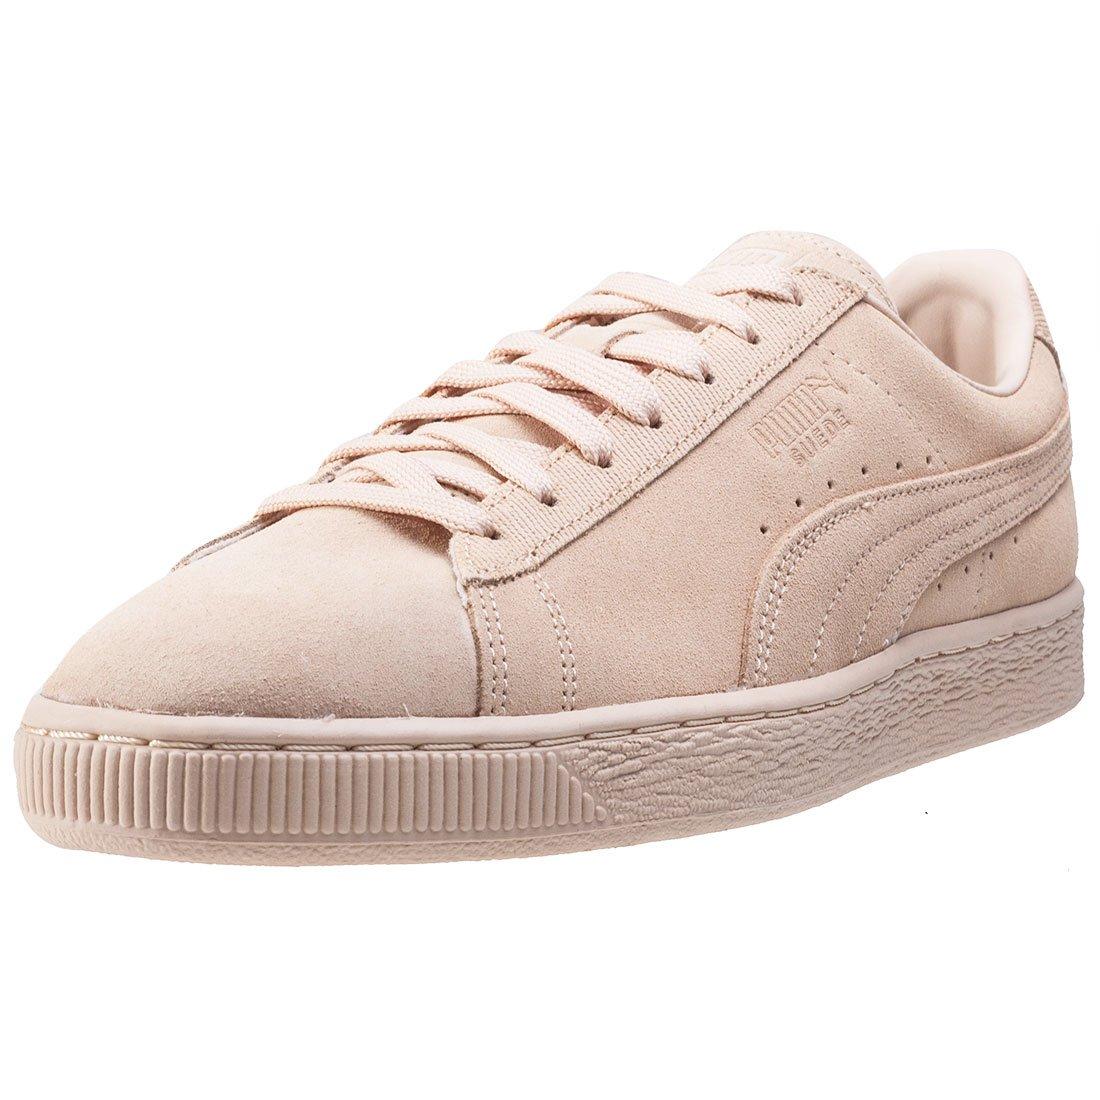 Puma Suede Classic Tonal 362595-02, Zapatillas para Mujer 40.5 EU|Natural Vachetta